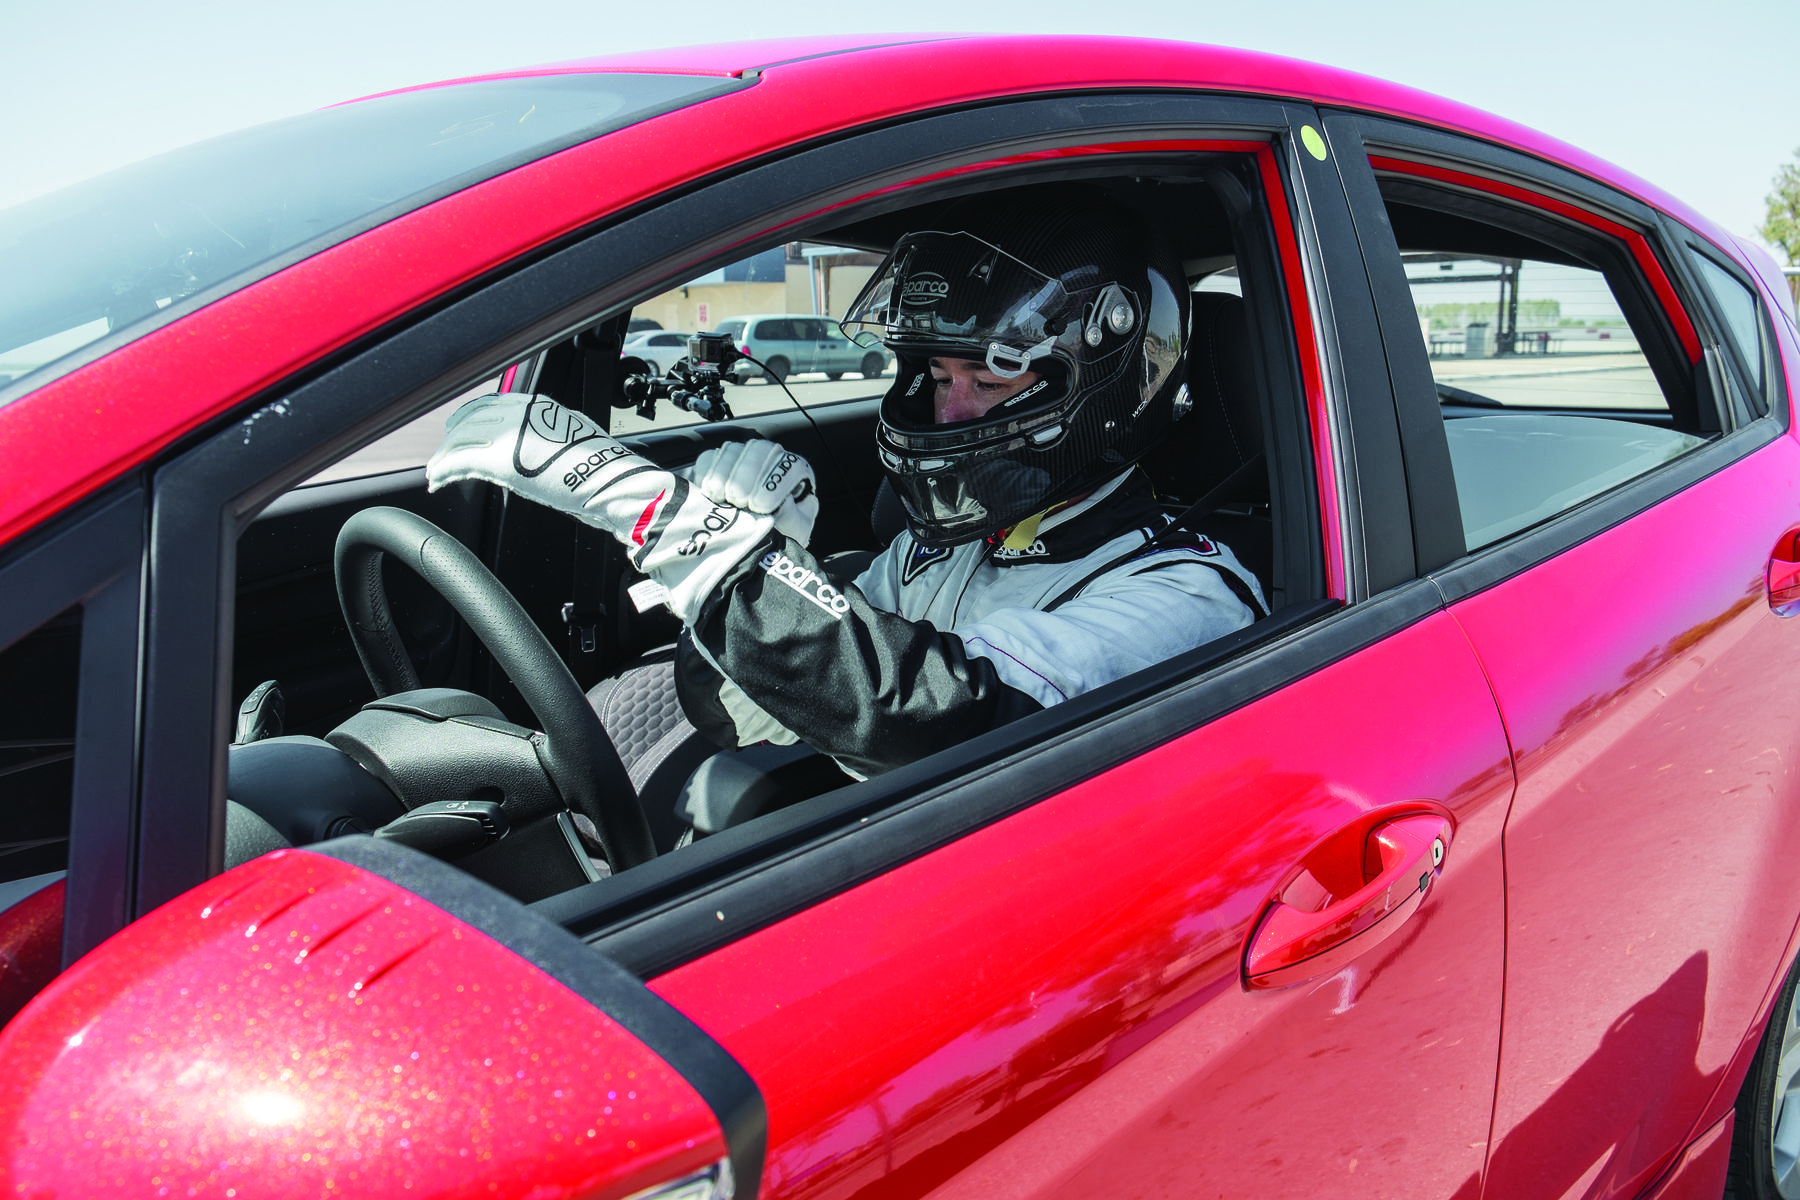 2015 Ford Fiesta ST | 2015 DSPORT Magazine Ford Fiesta ST